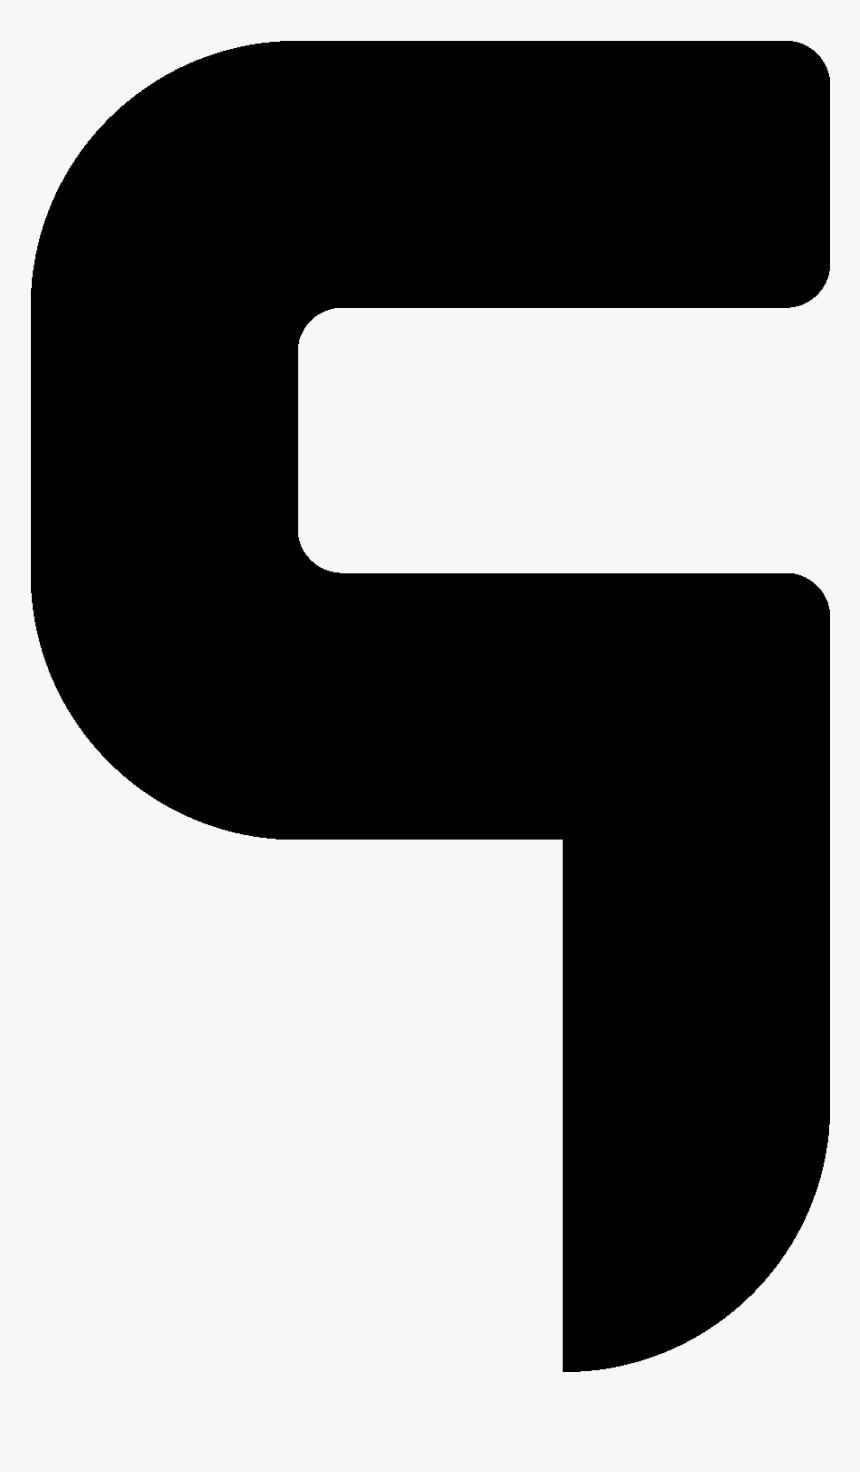 Transparent Optic Gaming Png - Ghost Gaming Logo Png, Png Download, Free Download